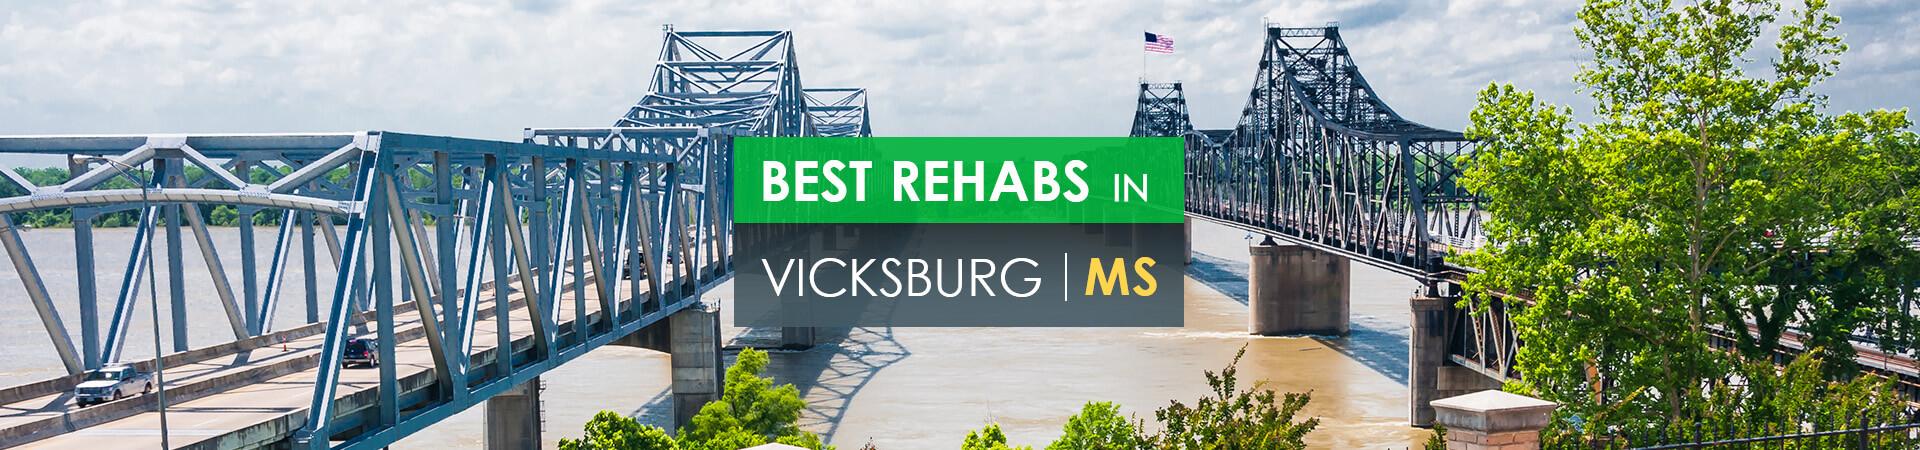 Best rehabs in Vicksburg, MS